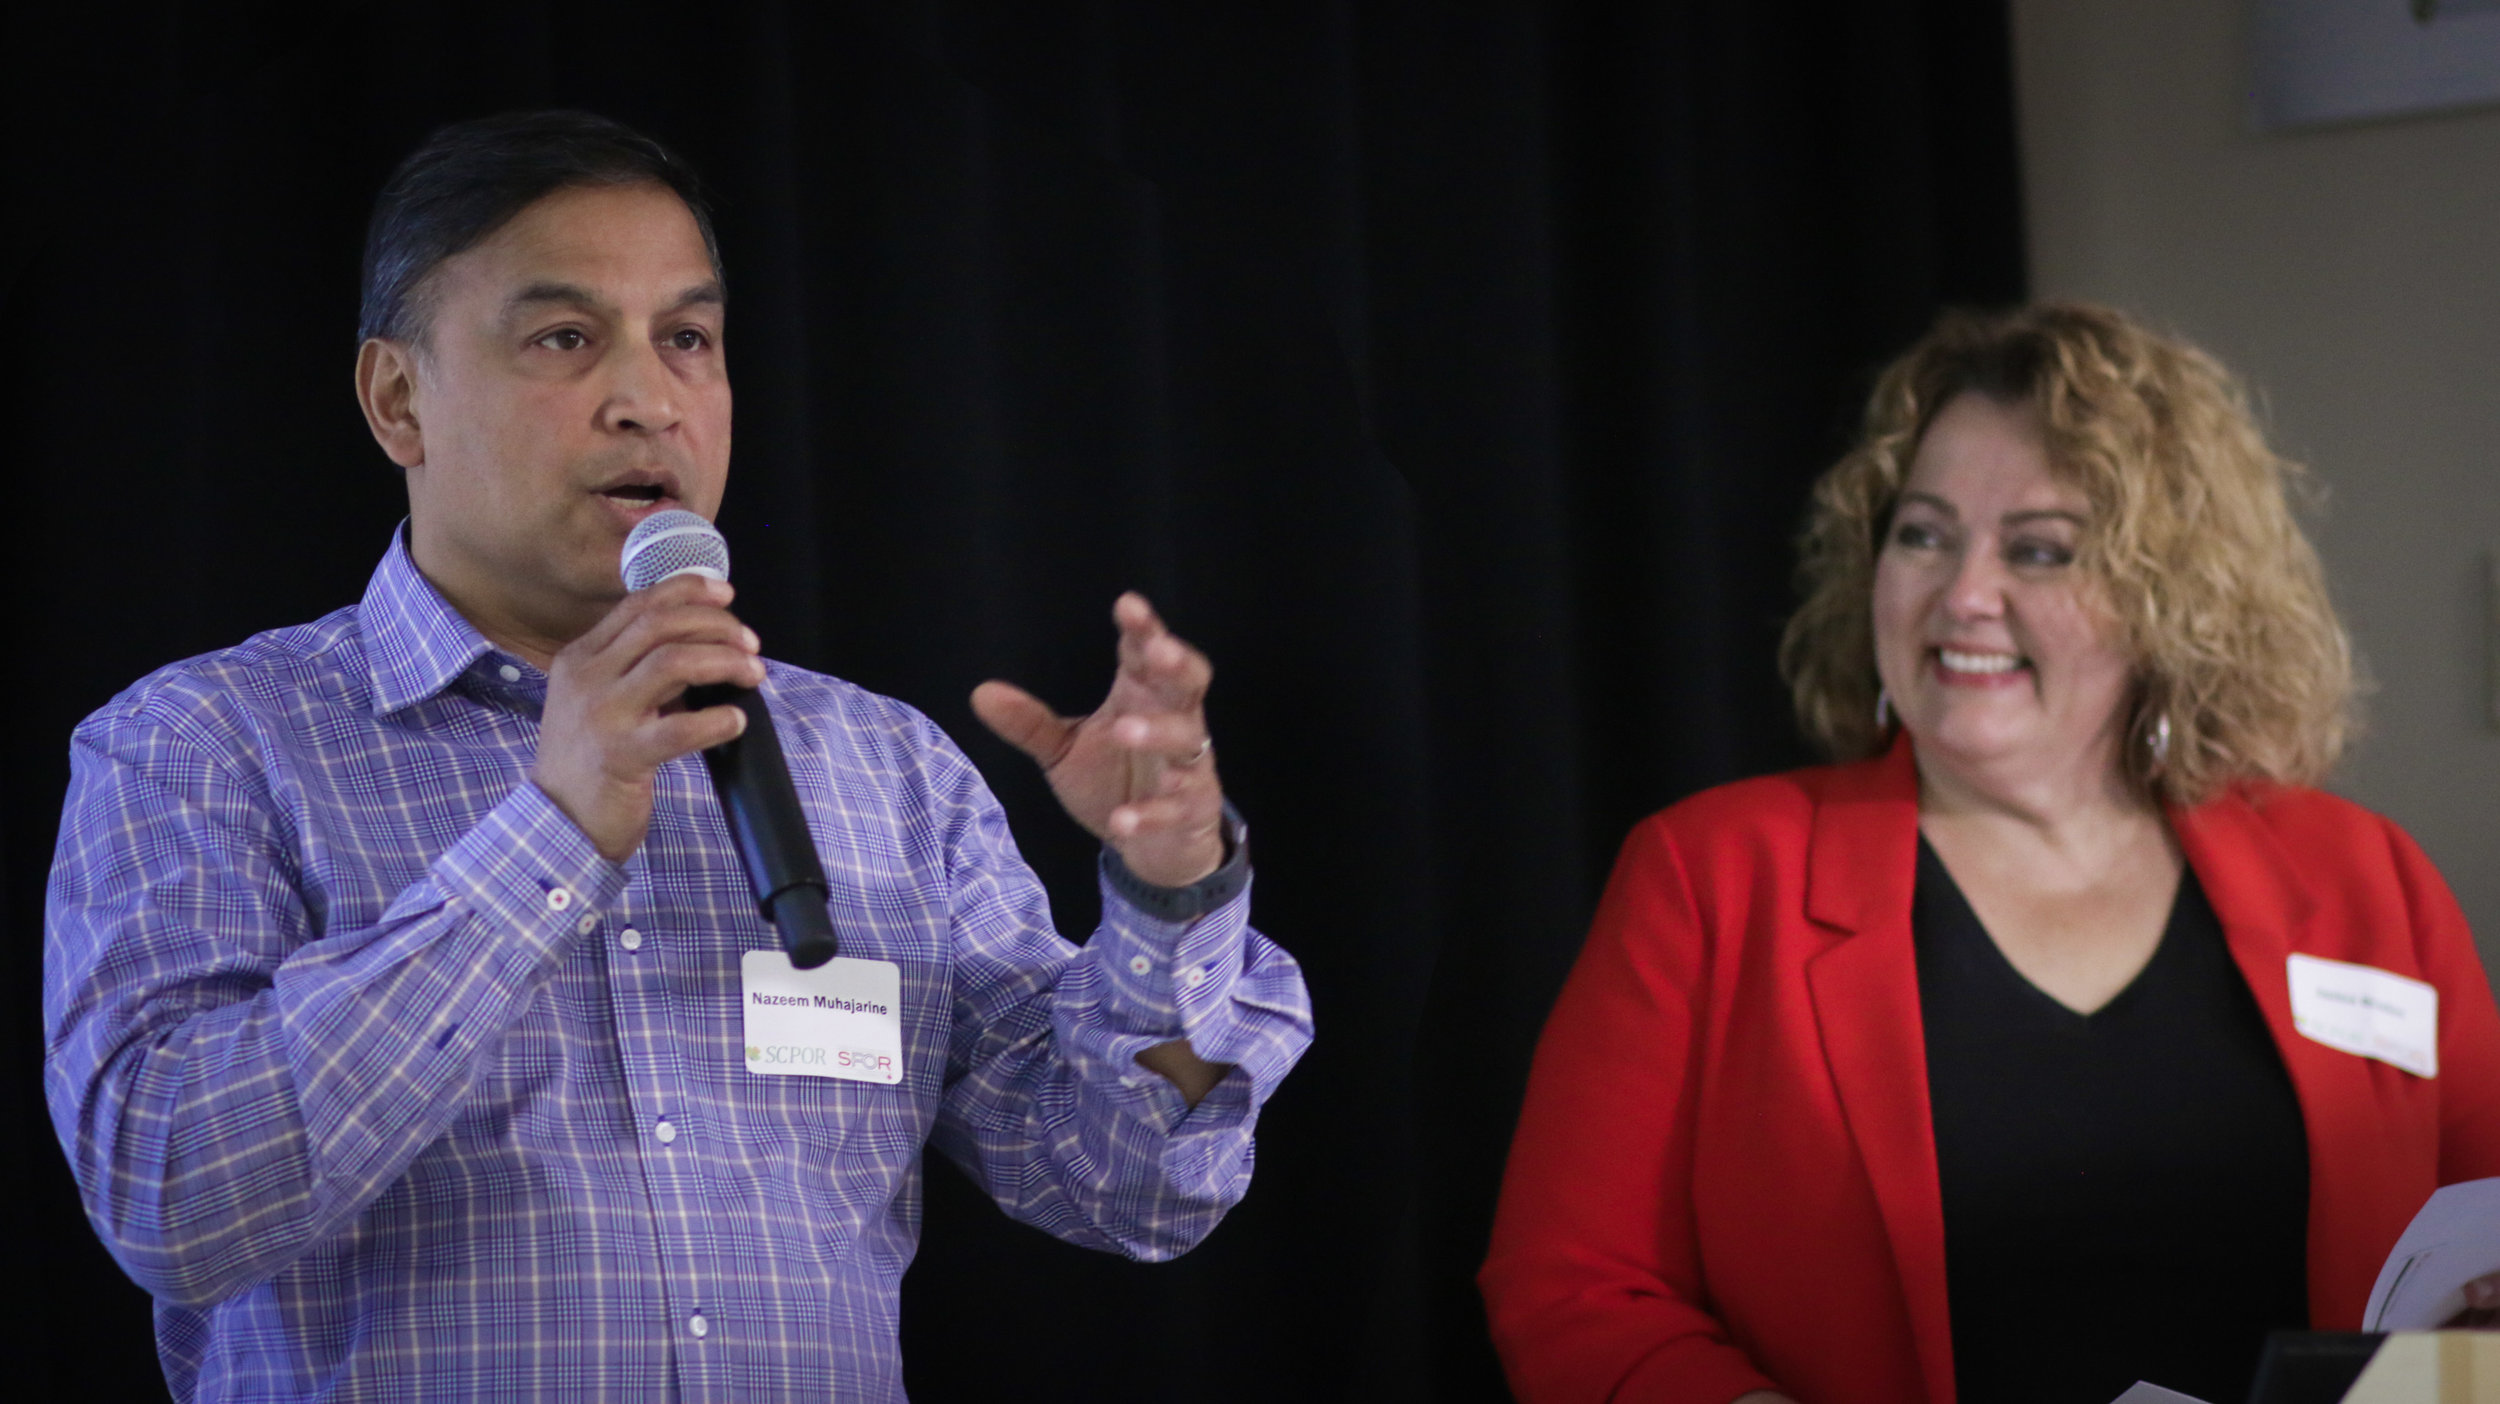 Dr. Nazeem Muhajarine and Janice Braden present on the SPOR Primary & Integrated Health Care Initiative